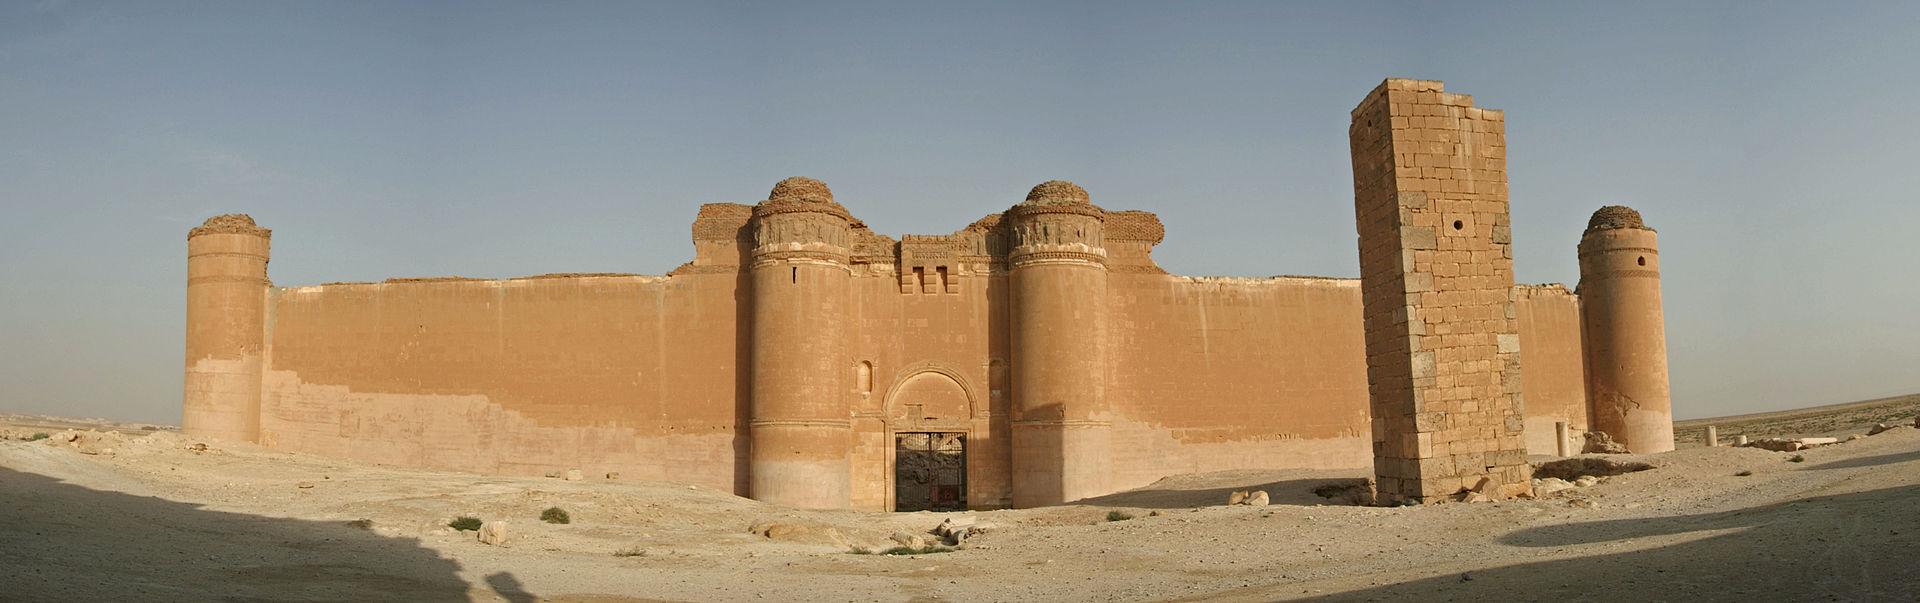 Qasr_al-Hayr_al-Sharqi.jpg